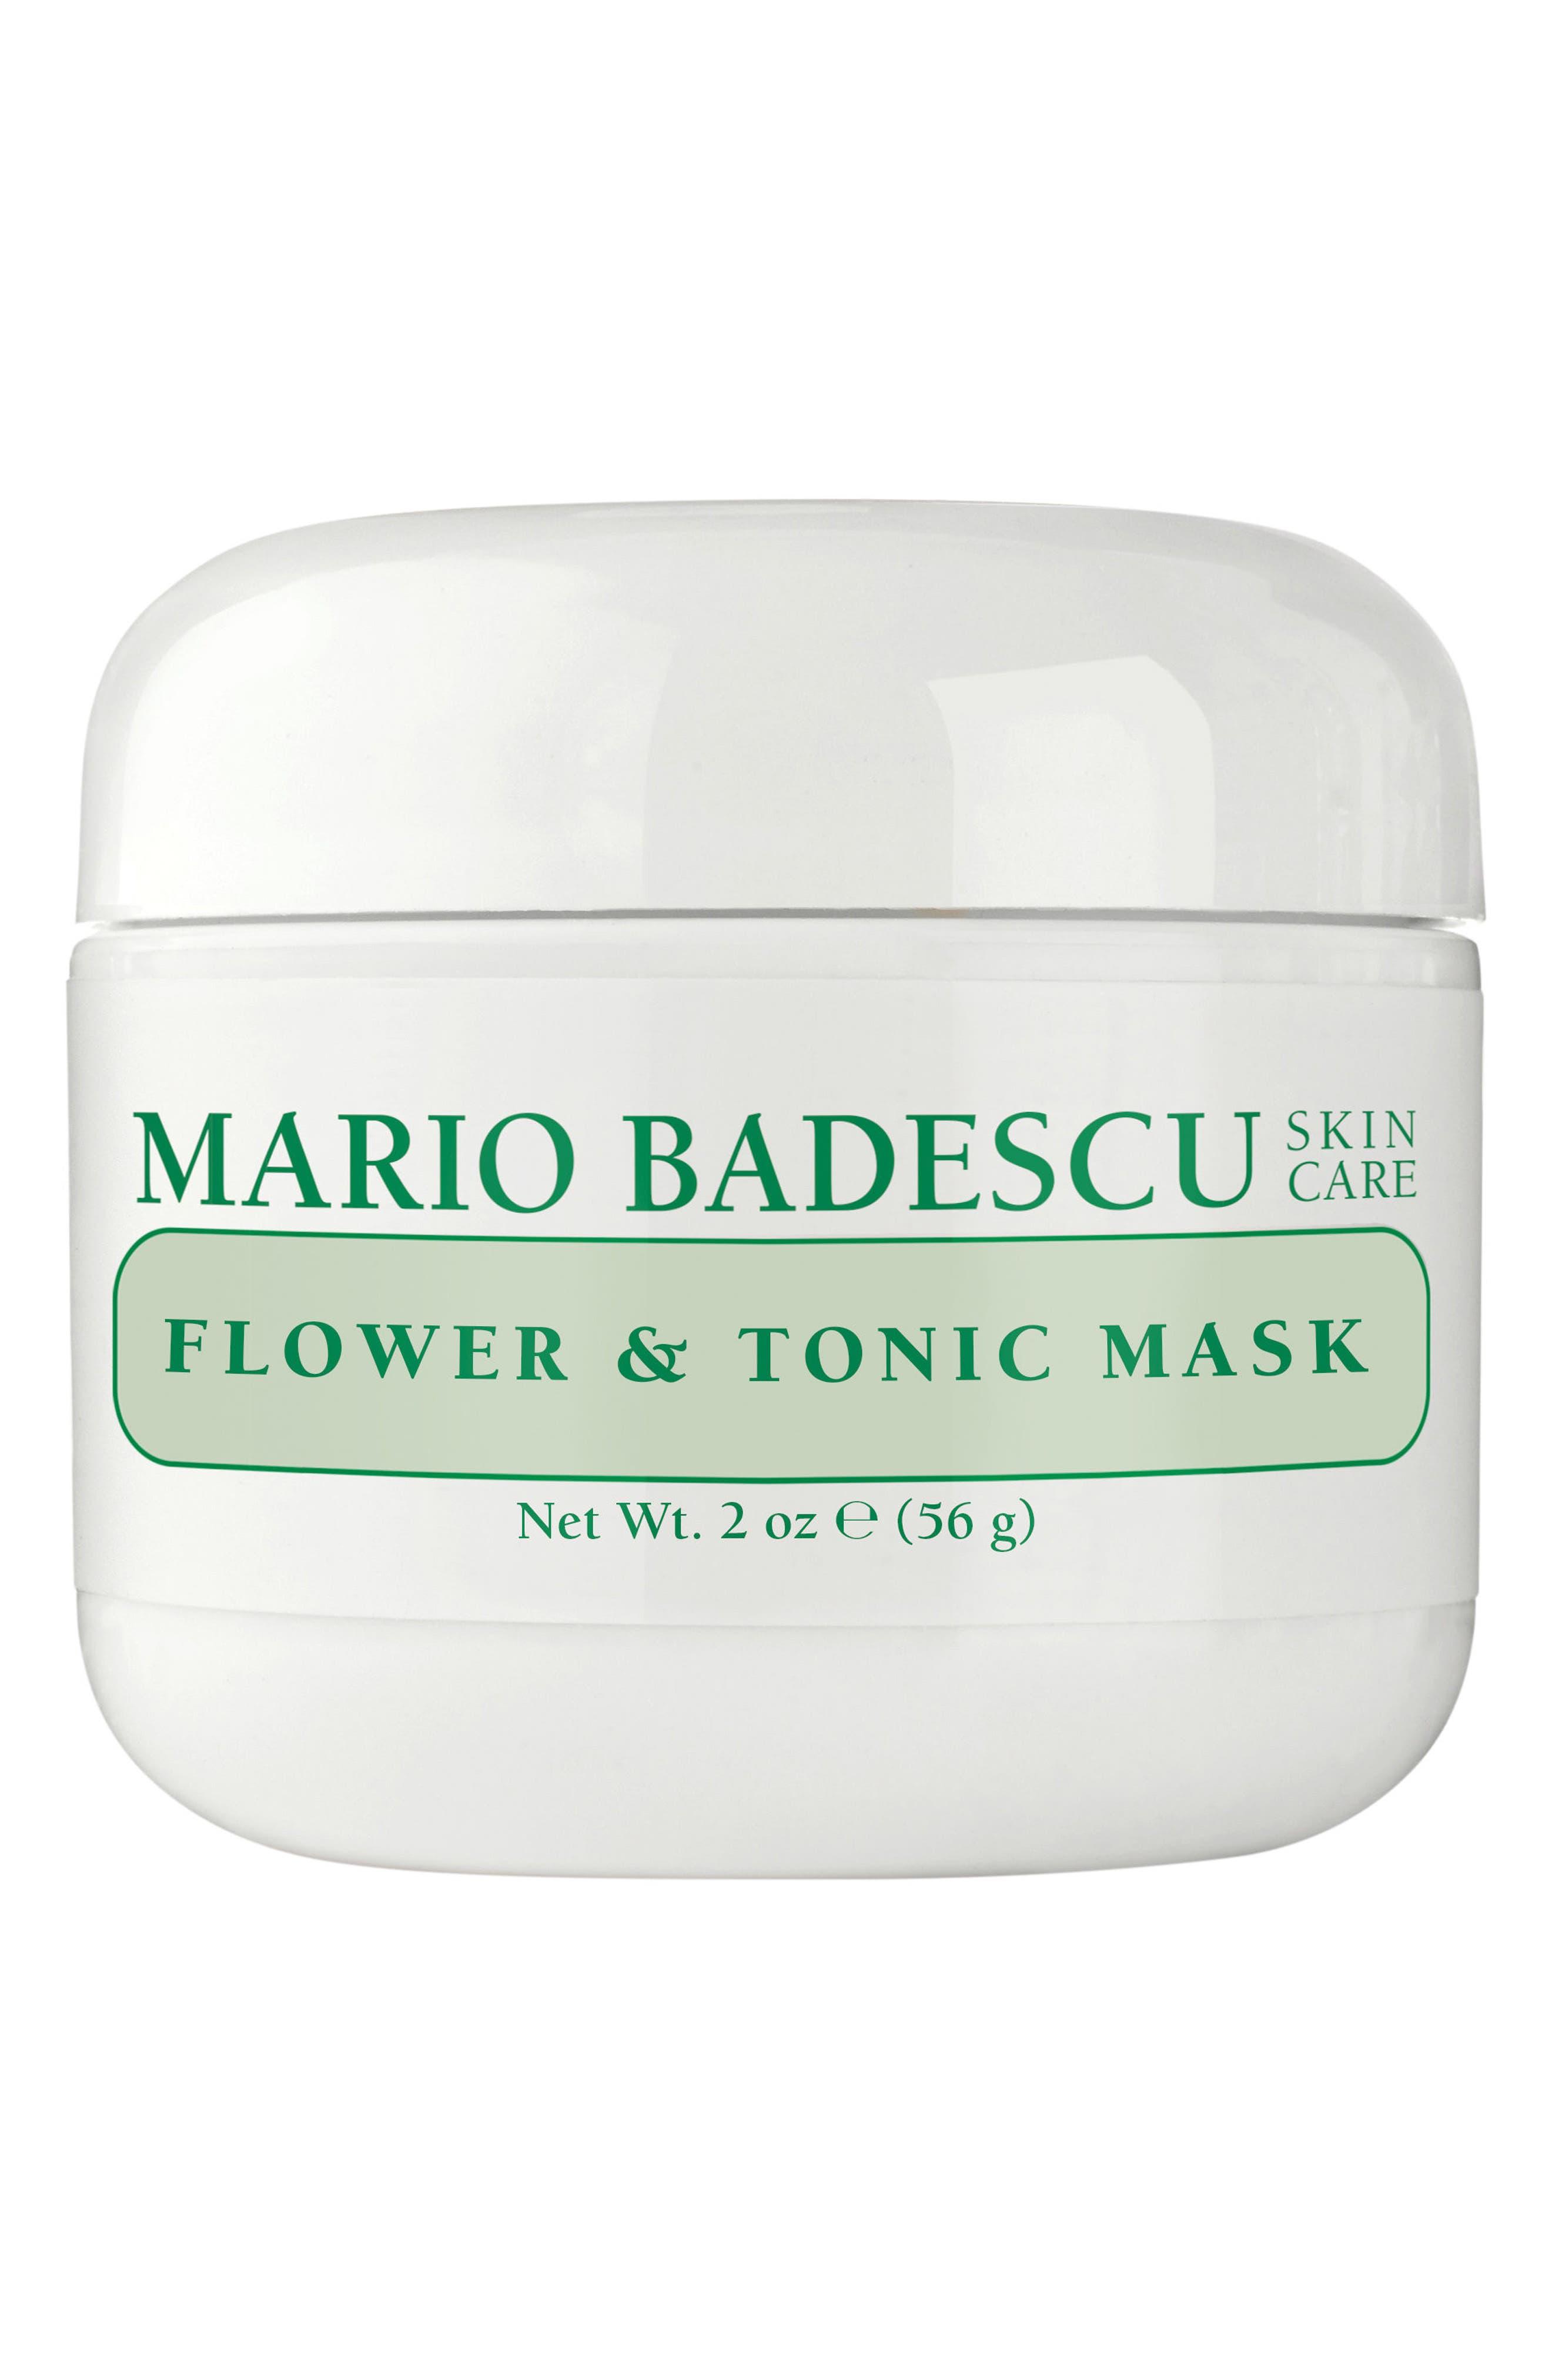 MARIO BADESCU Flower & Tonic Mask, Main, color, NO COLOR